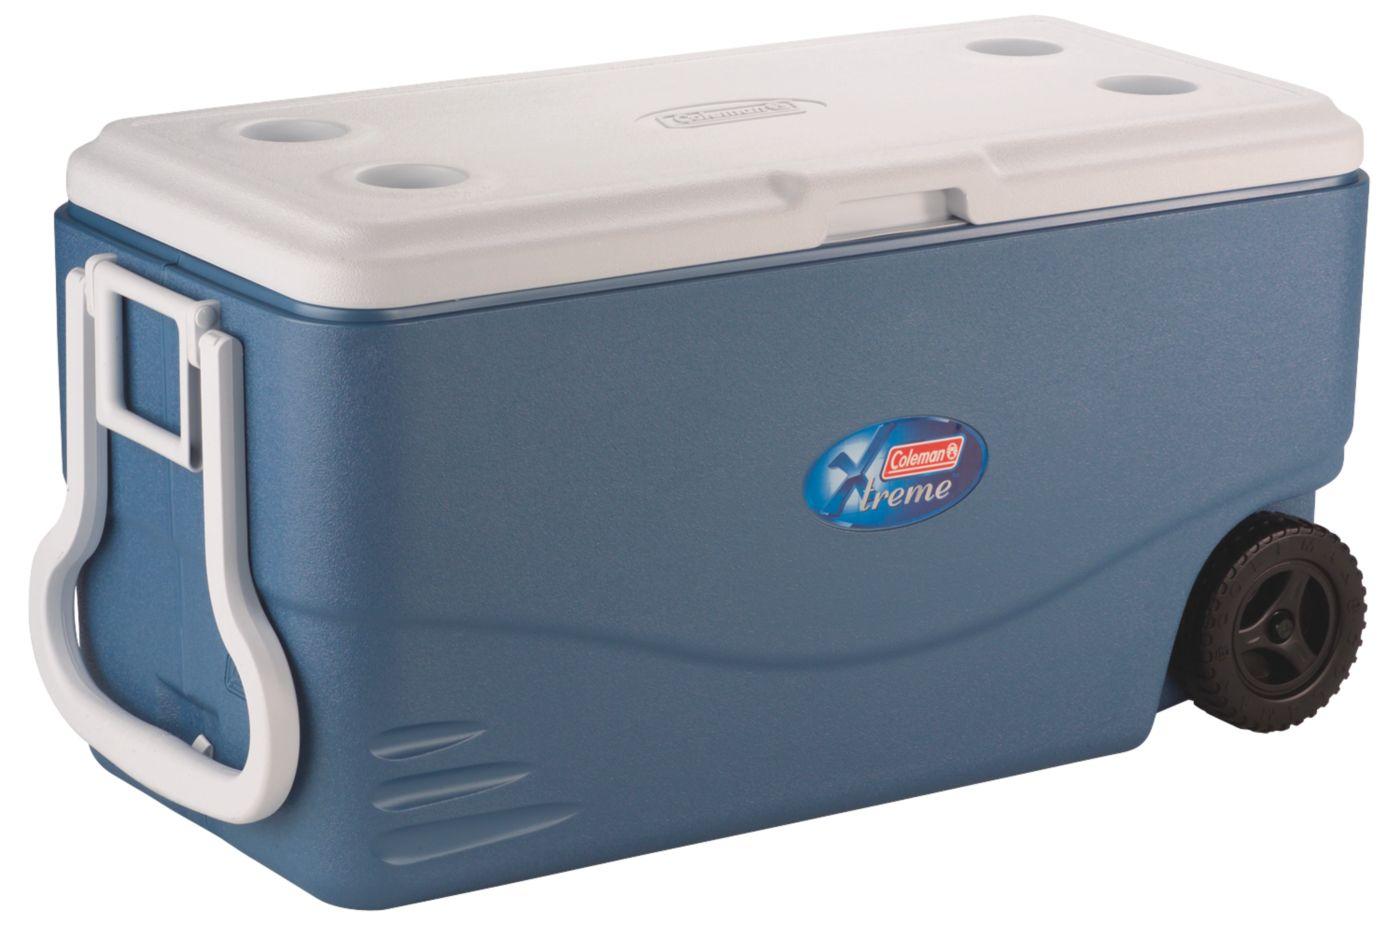 100 Qt Wheeled Xtreme 5 Cooler - Iceberg Blue Coleman